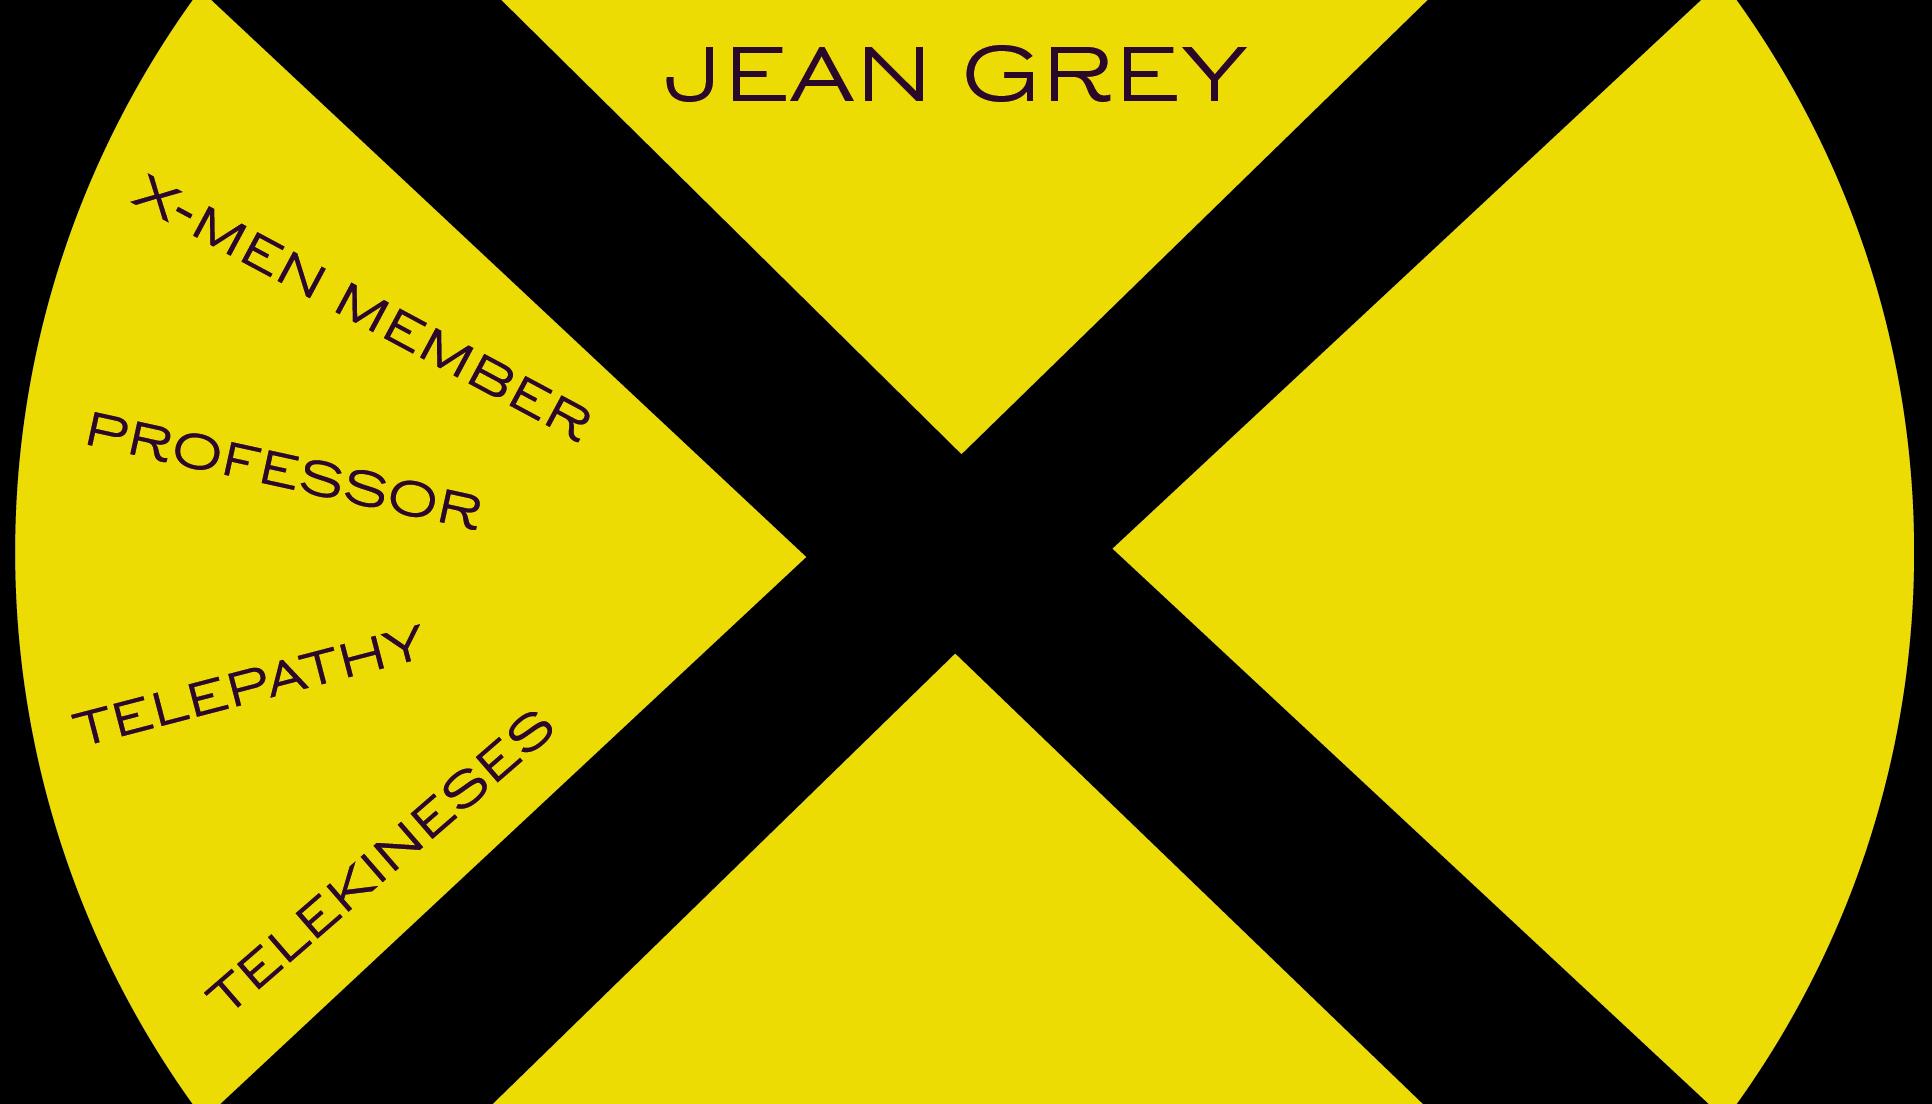 Jean Grey Business Card Side 2